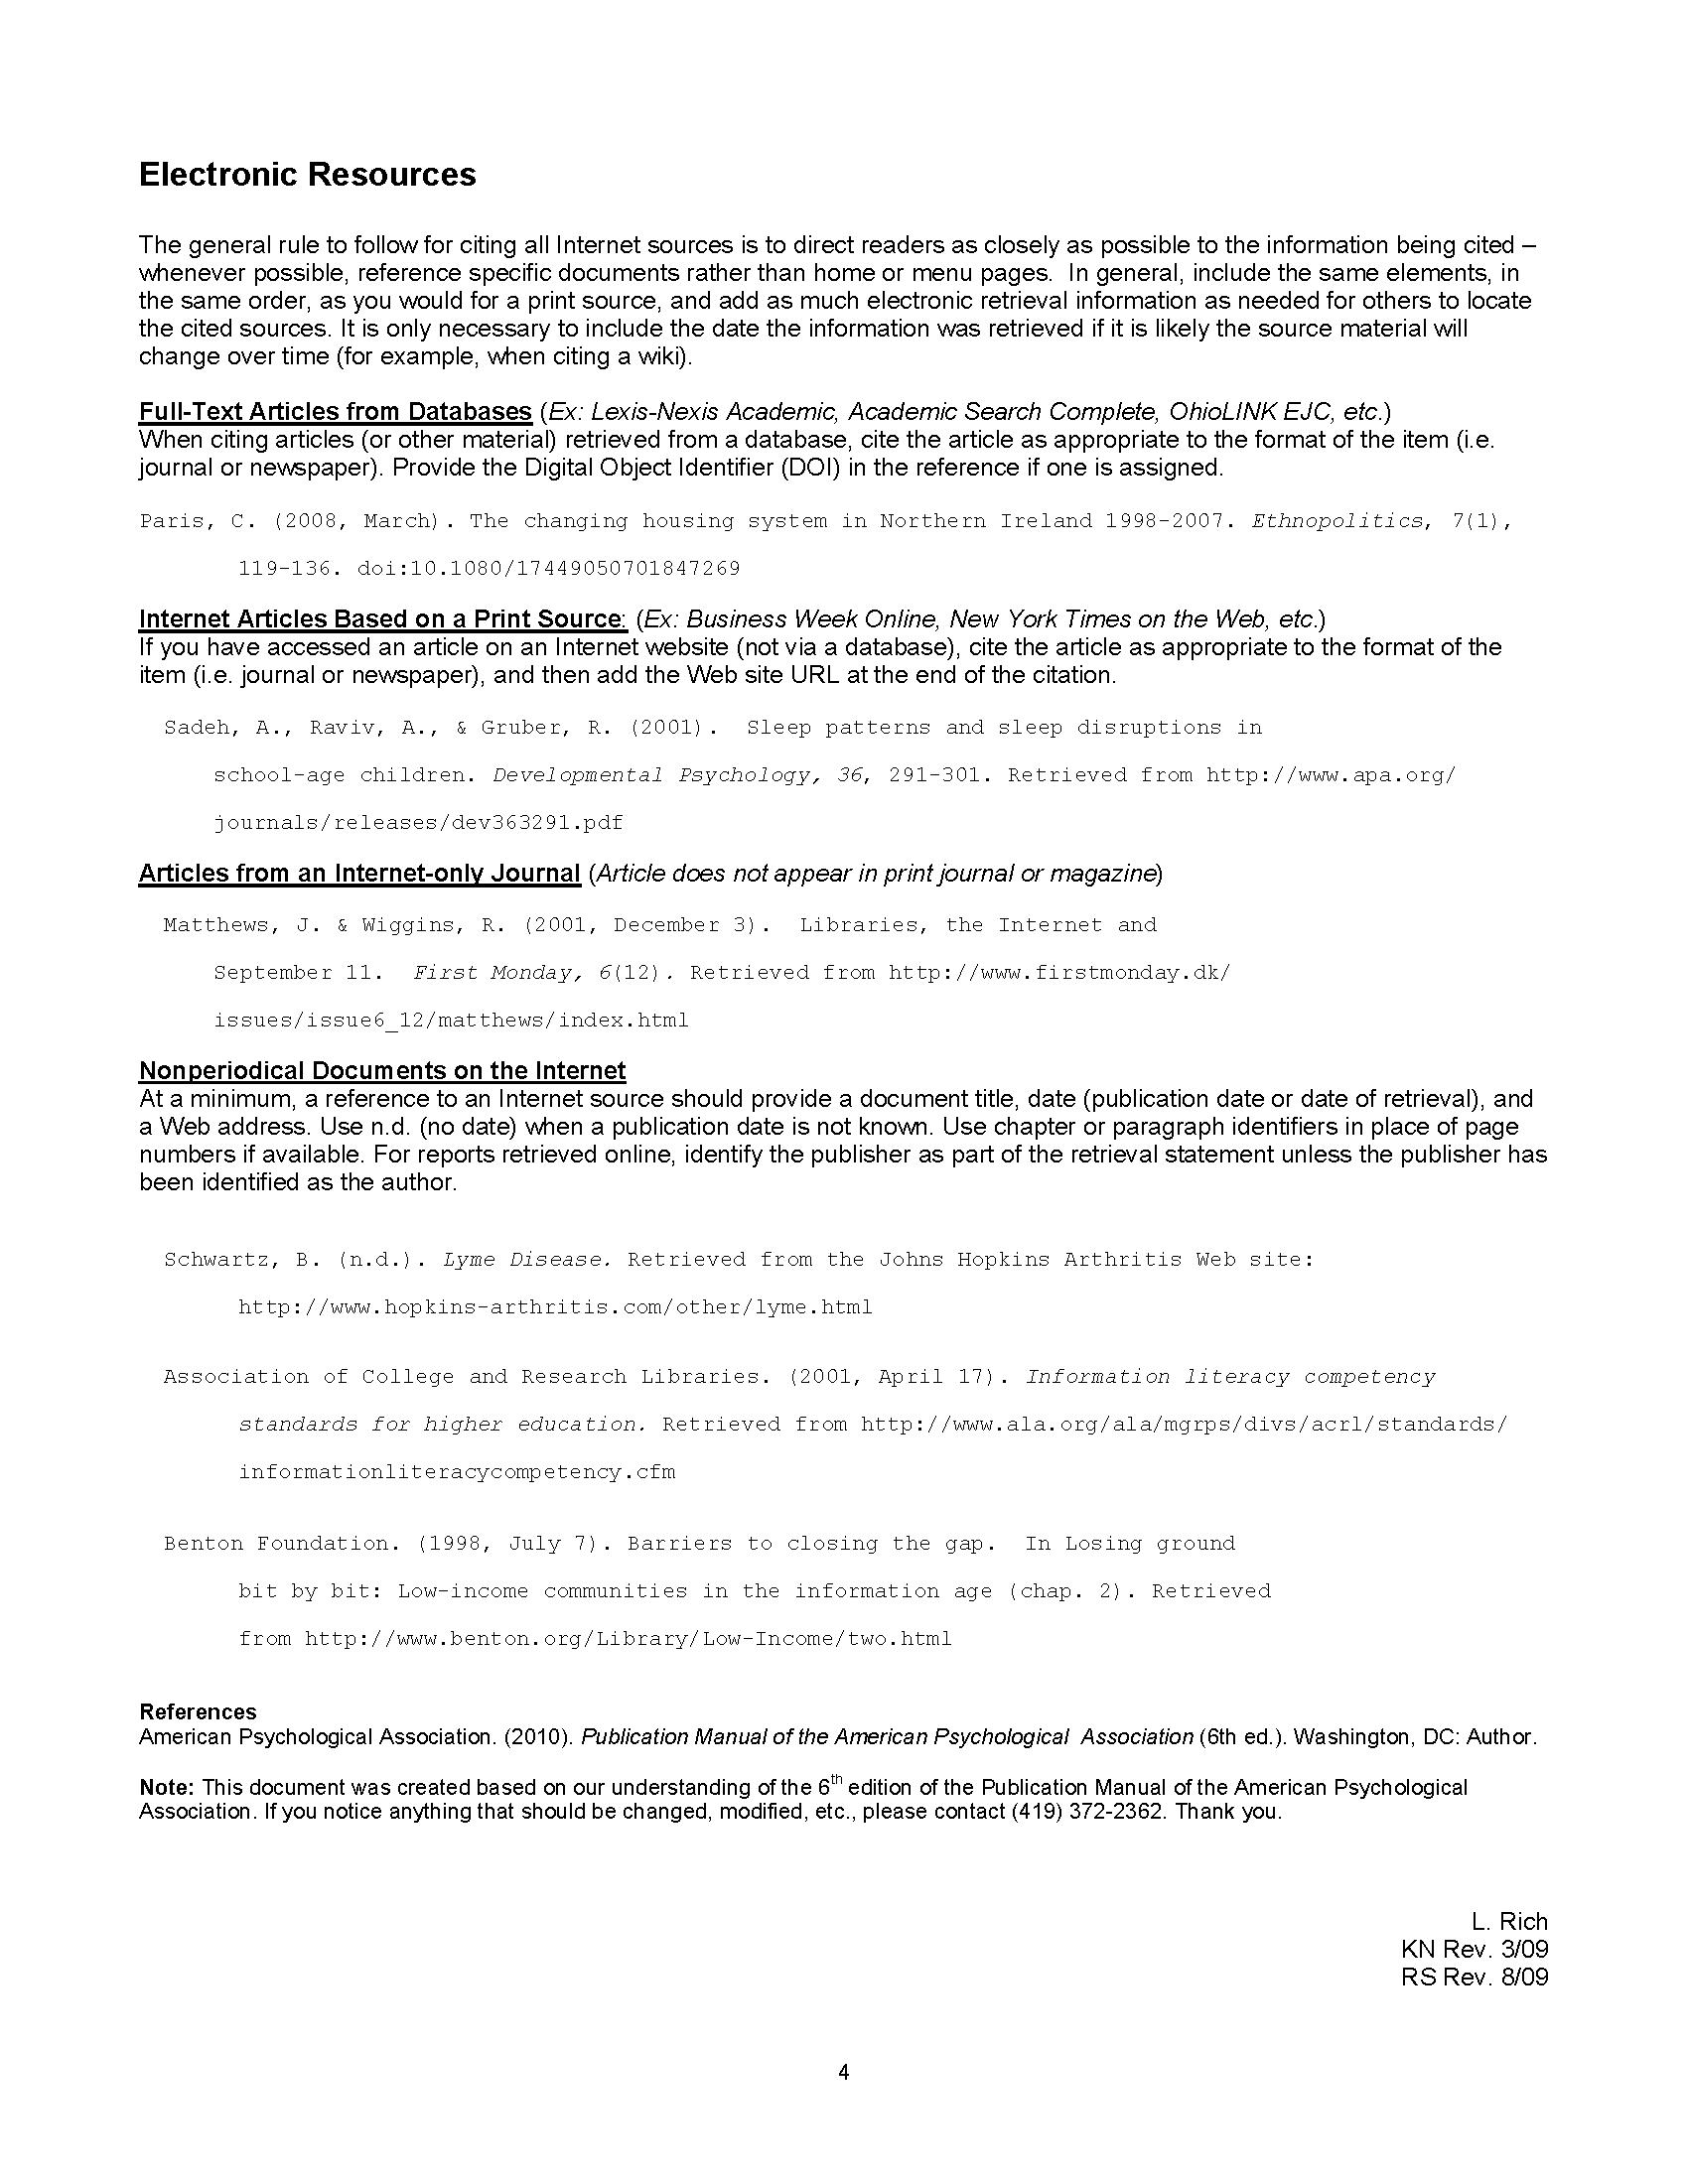 Cheap essay writing service ukc image 3